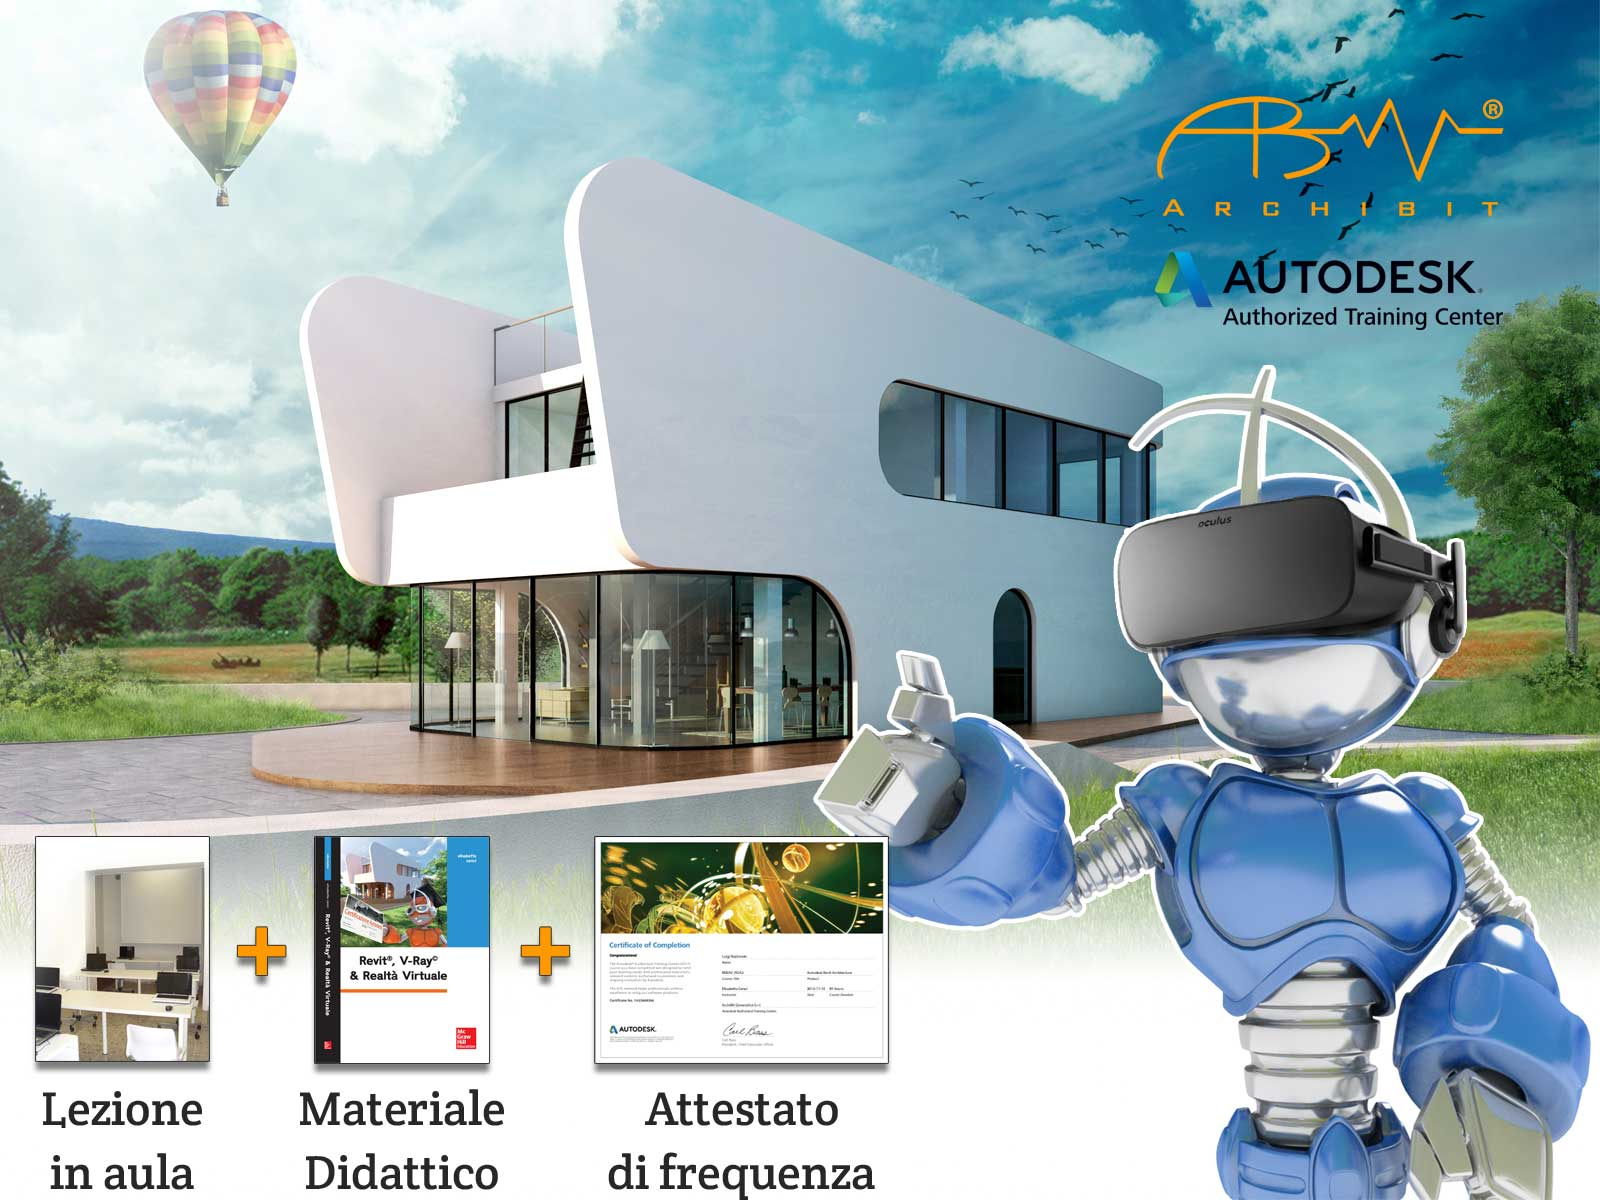 Corso V-Ray per Revit - ArchiBit centro corsi Autodesk Revit e Vray e Realtà Virtuale BIM VR a roma